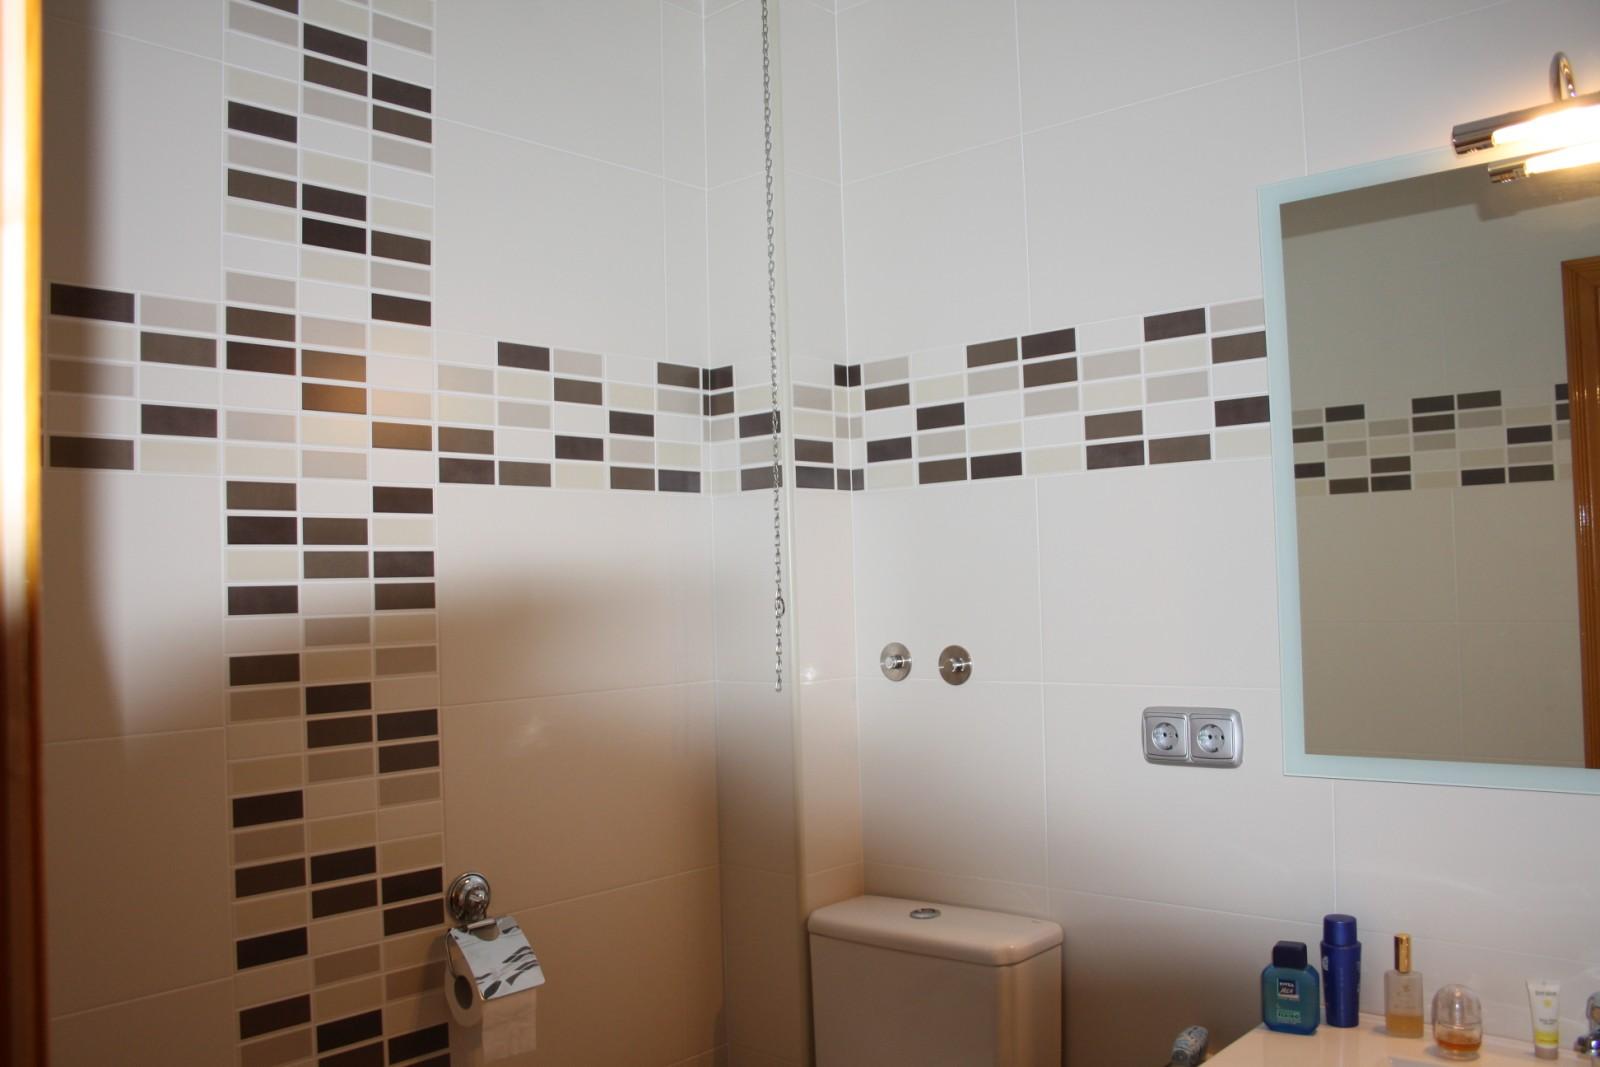 baño blanco con cenefa negra ~ dikidu